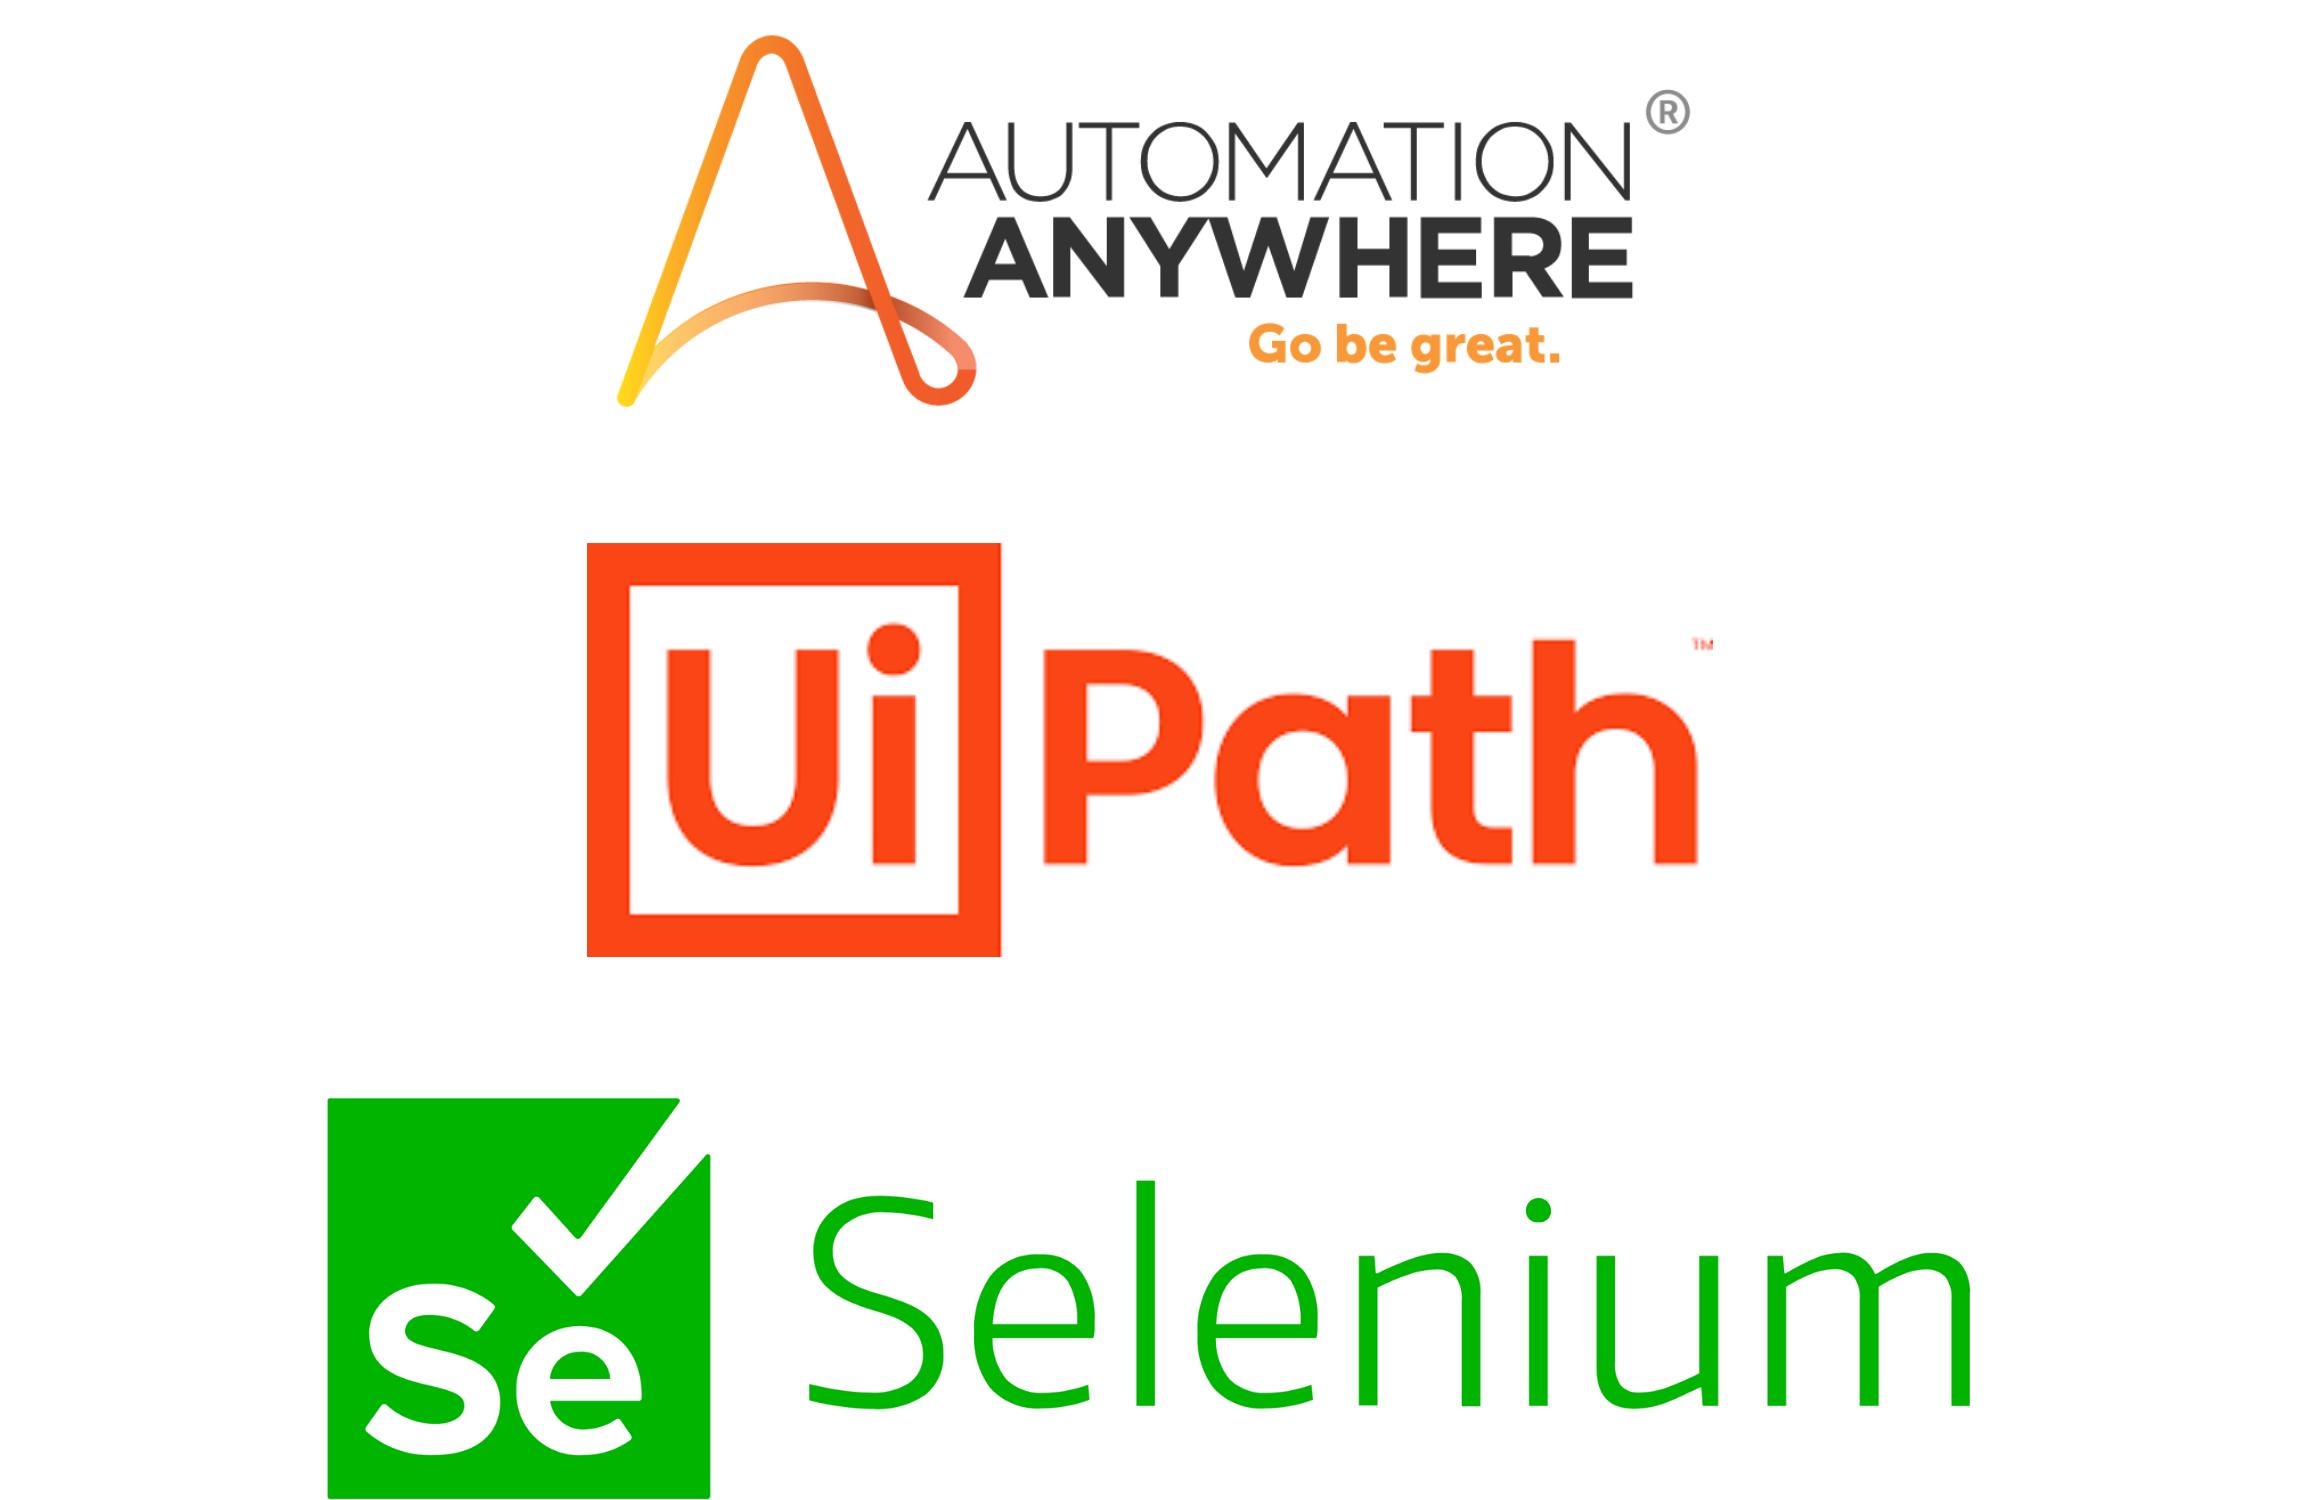 robotic process automation sunflower lab automation anywhere uipath selenium